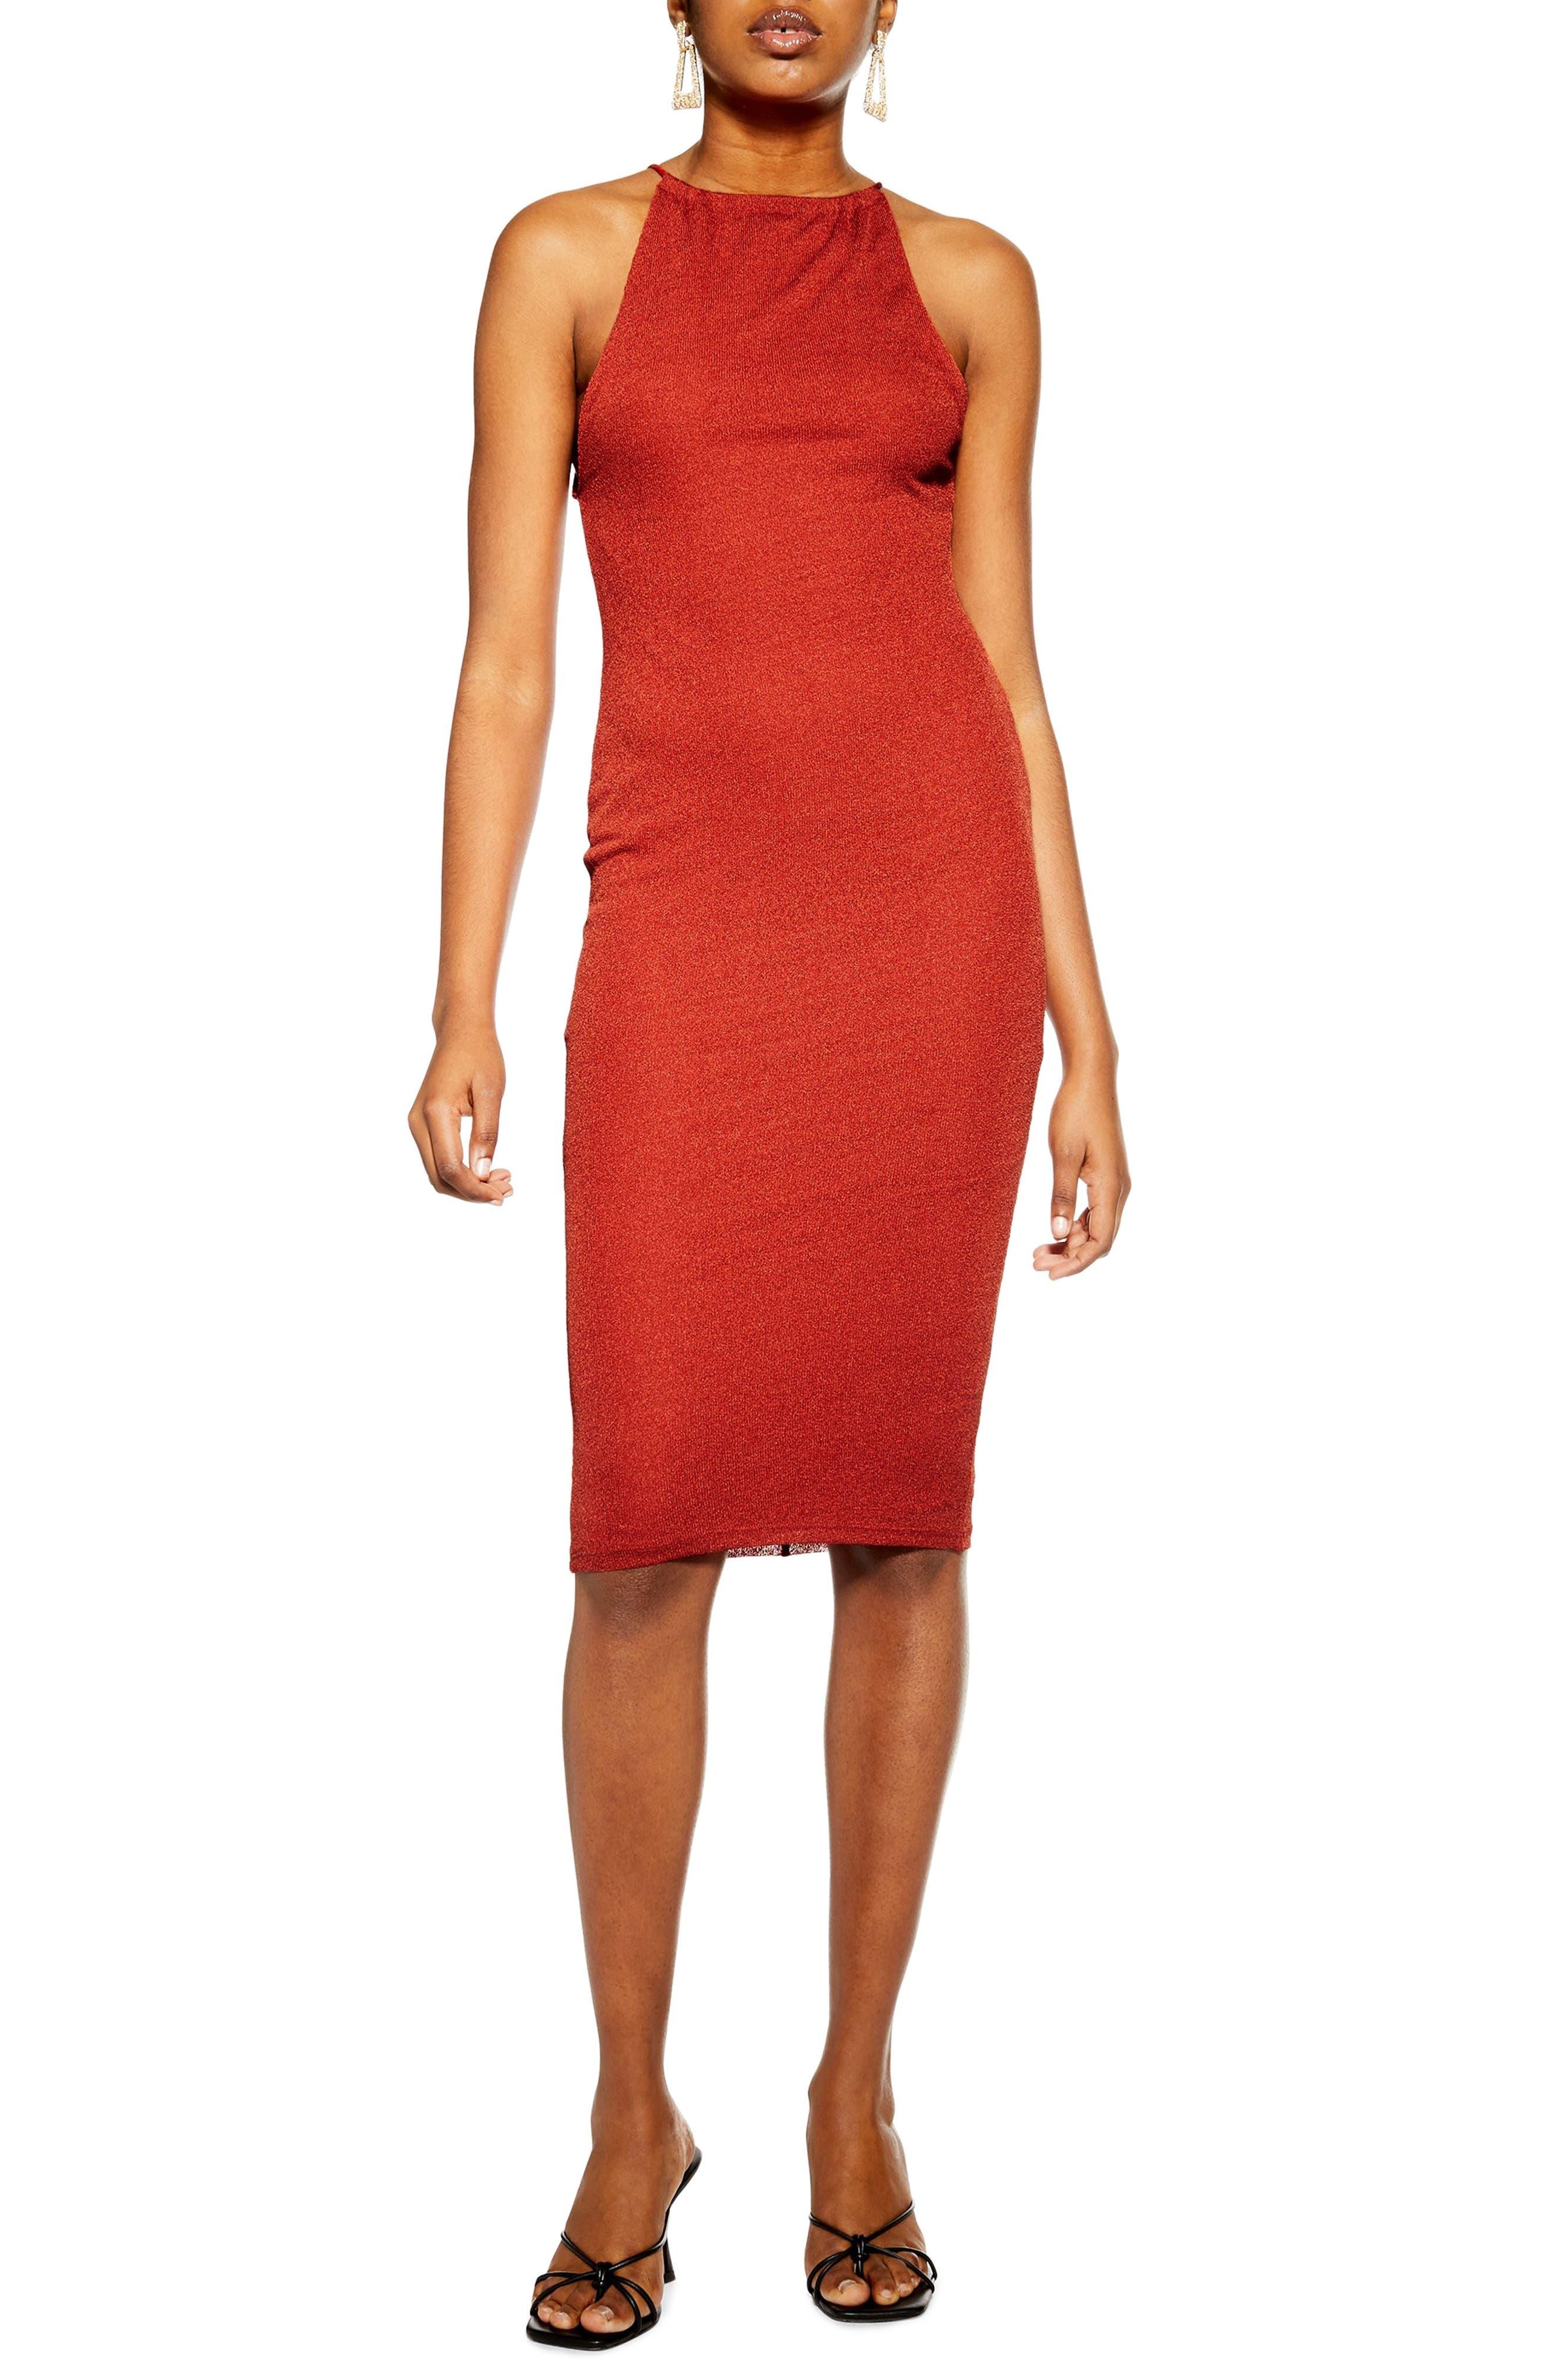 Topshop Cut And Sew Sleeveless Body-Con Dress, US (fits like 0-2) - Metallic